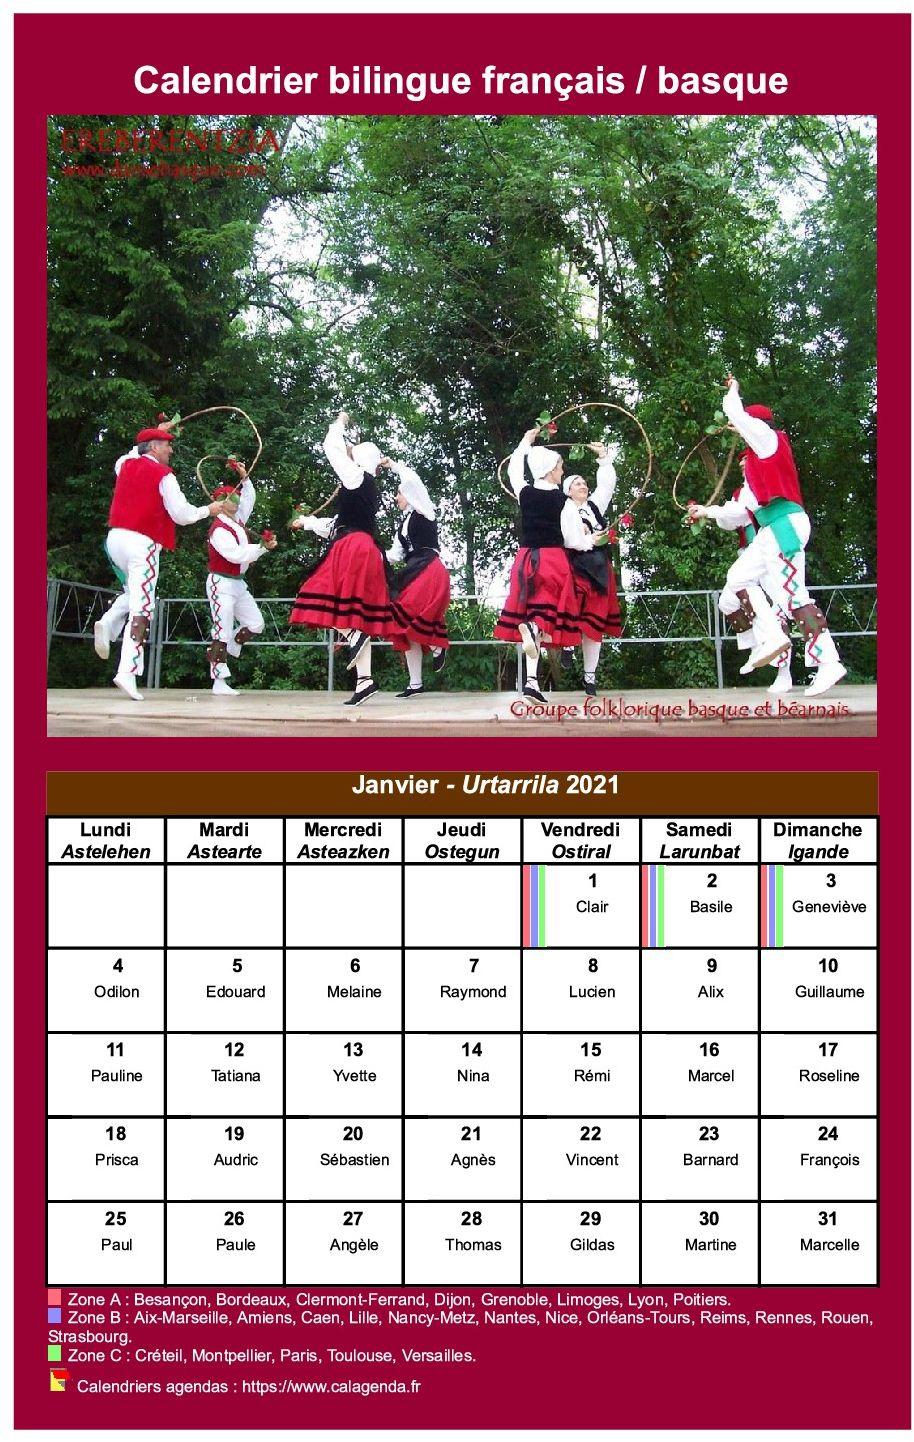 Calendrier mensuel 2021 basque